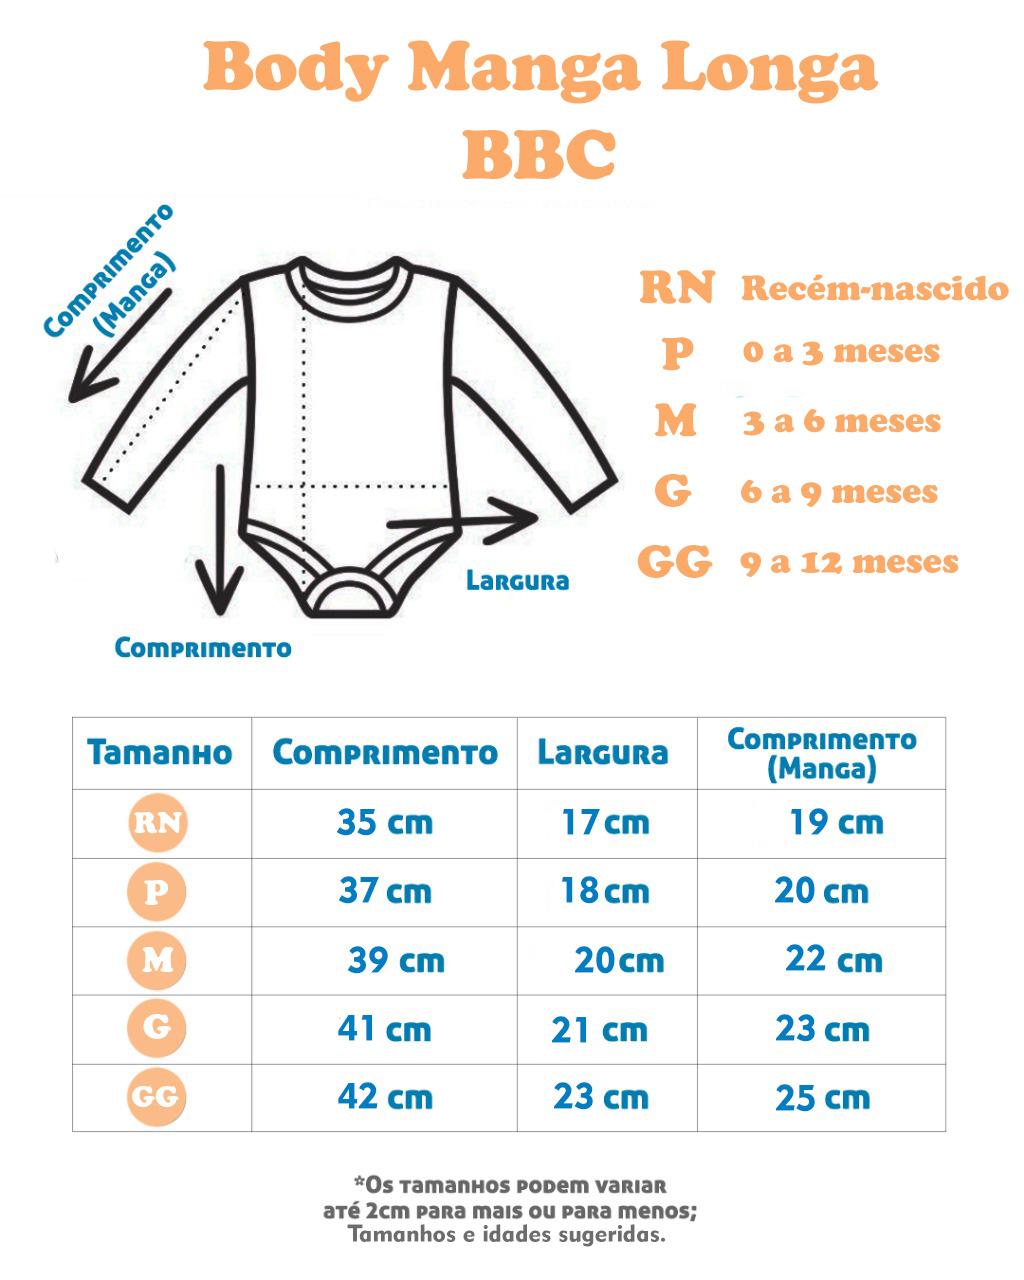 Body Manga Longa Elefante Rosa (RN/P/M/G/GG)